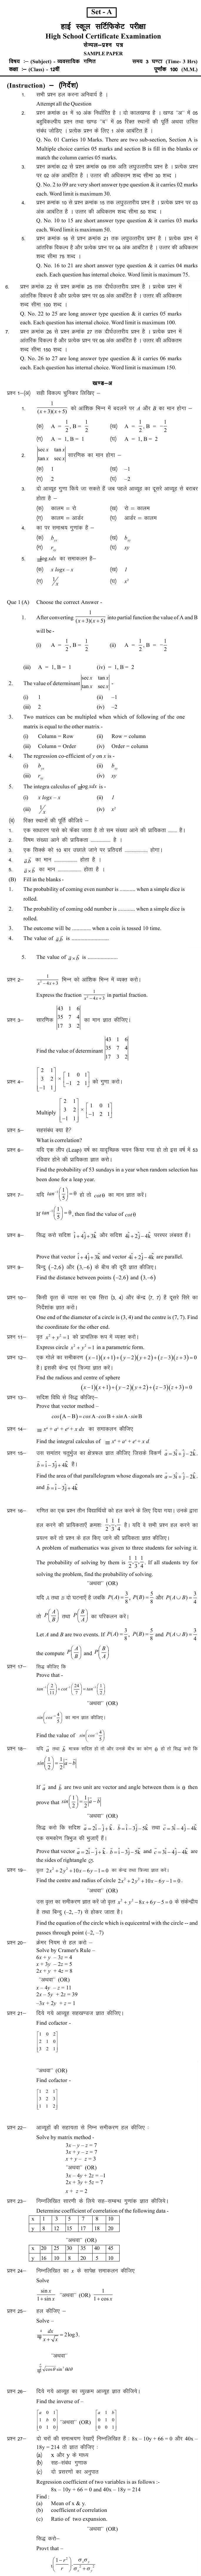 Chattisgarh Board Class 12 Occupational Mathematics (Vyavasayik Ganit)Sample Paper